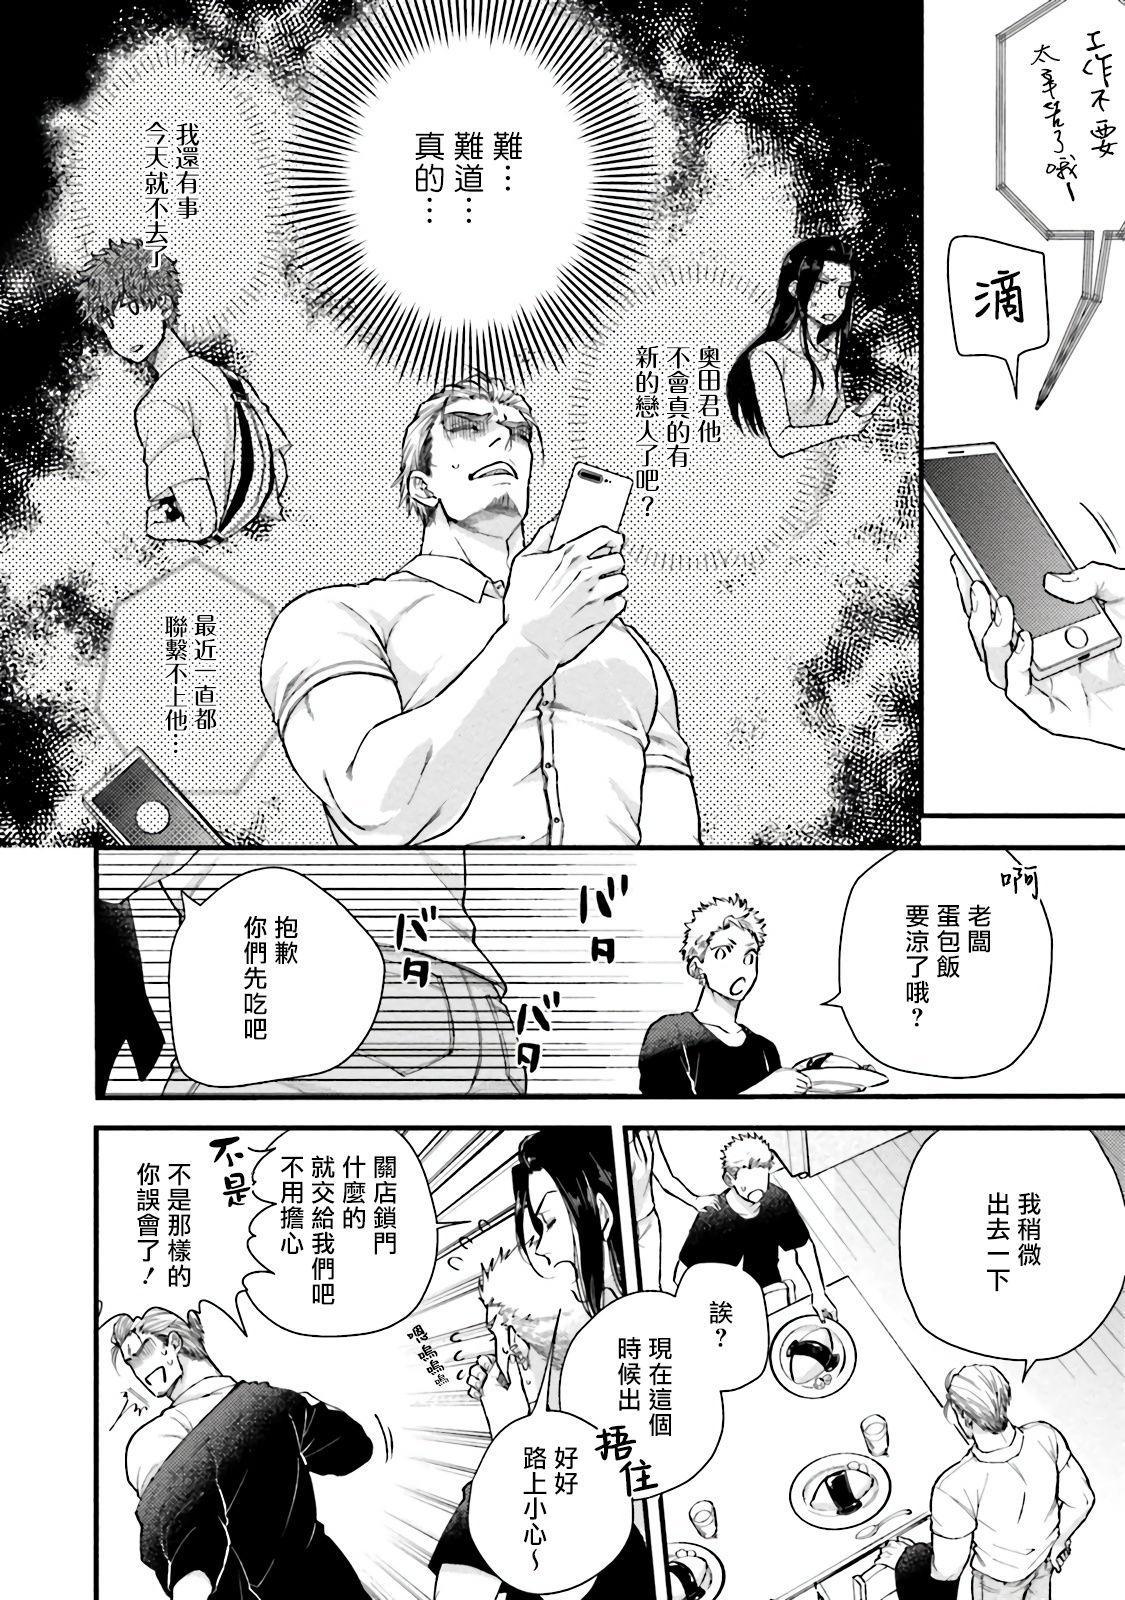 Kinou wa Otanoshimi Deshita ne | 昨天过得很愉快吧 Ch. 1-4+特典 62